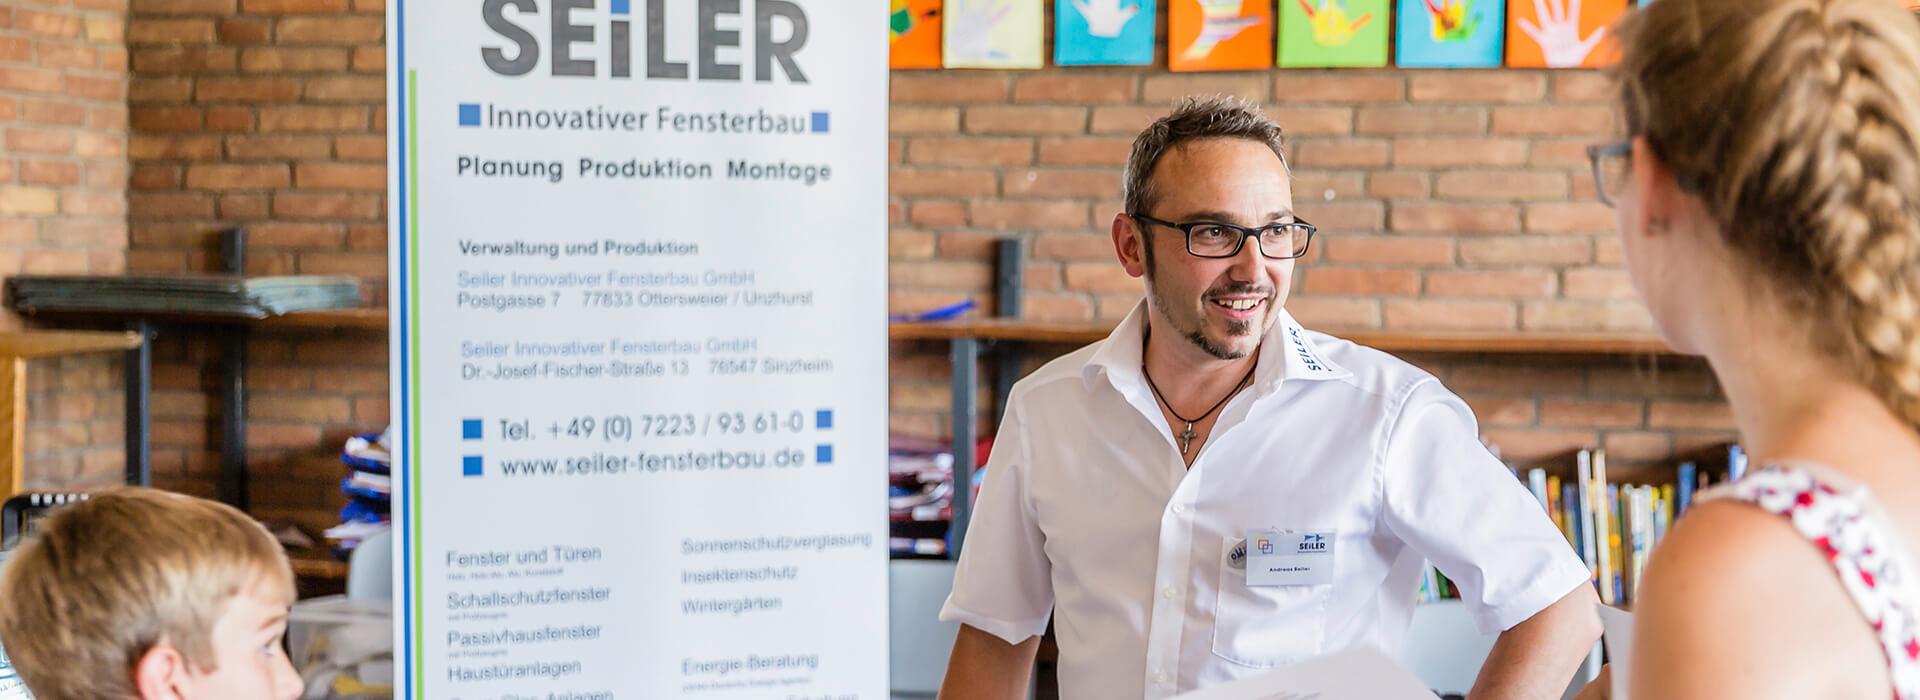 Ausbildungsbörse 2019 in Ottersweier